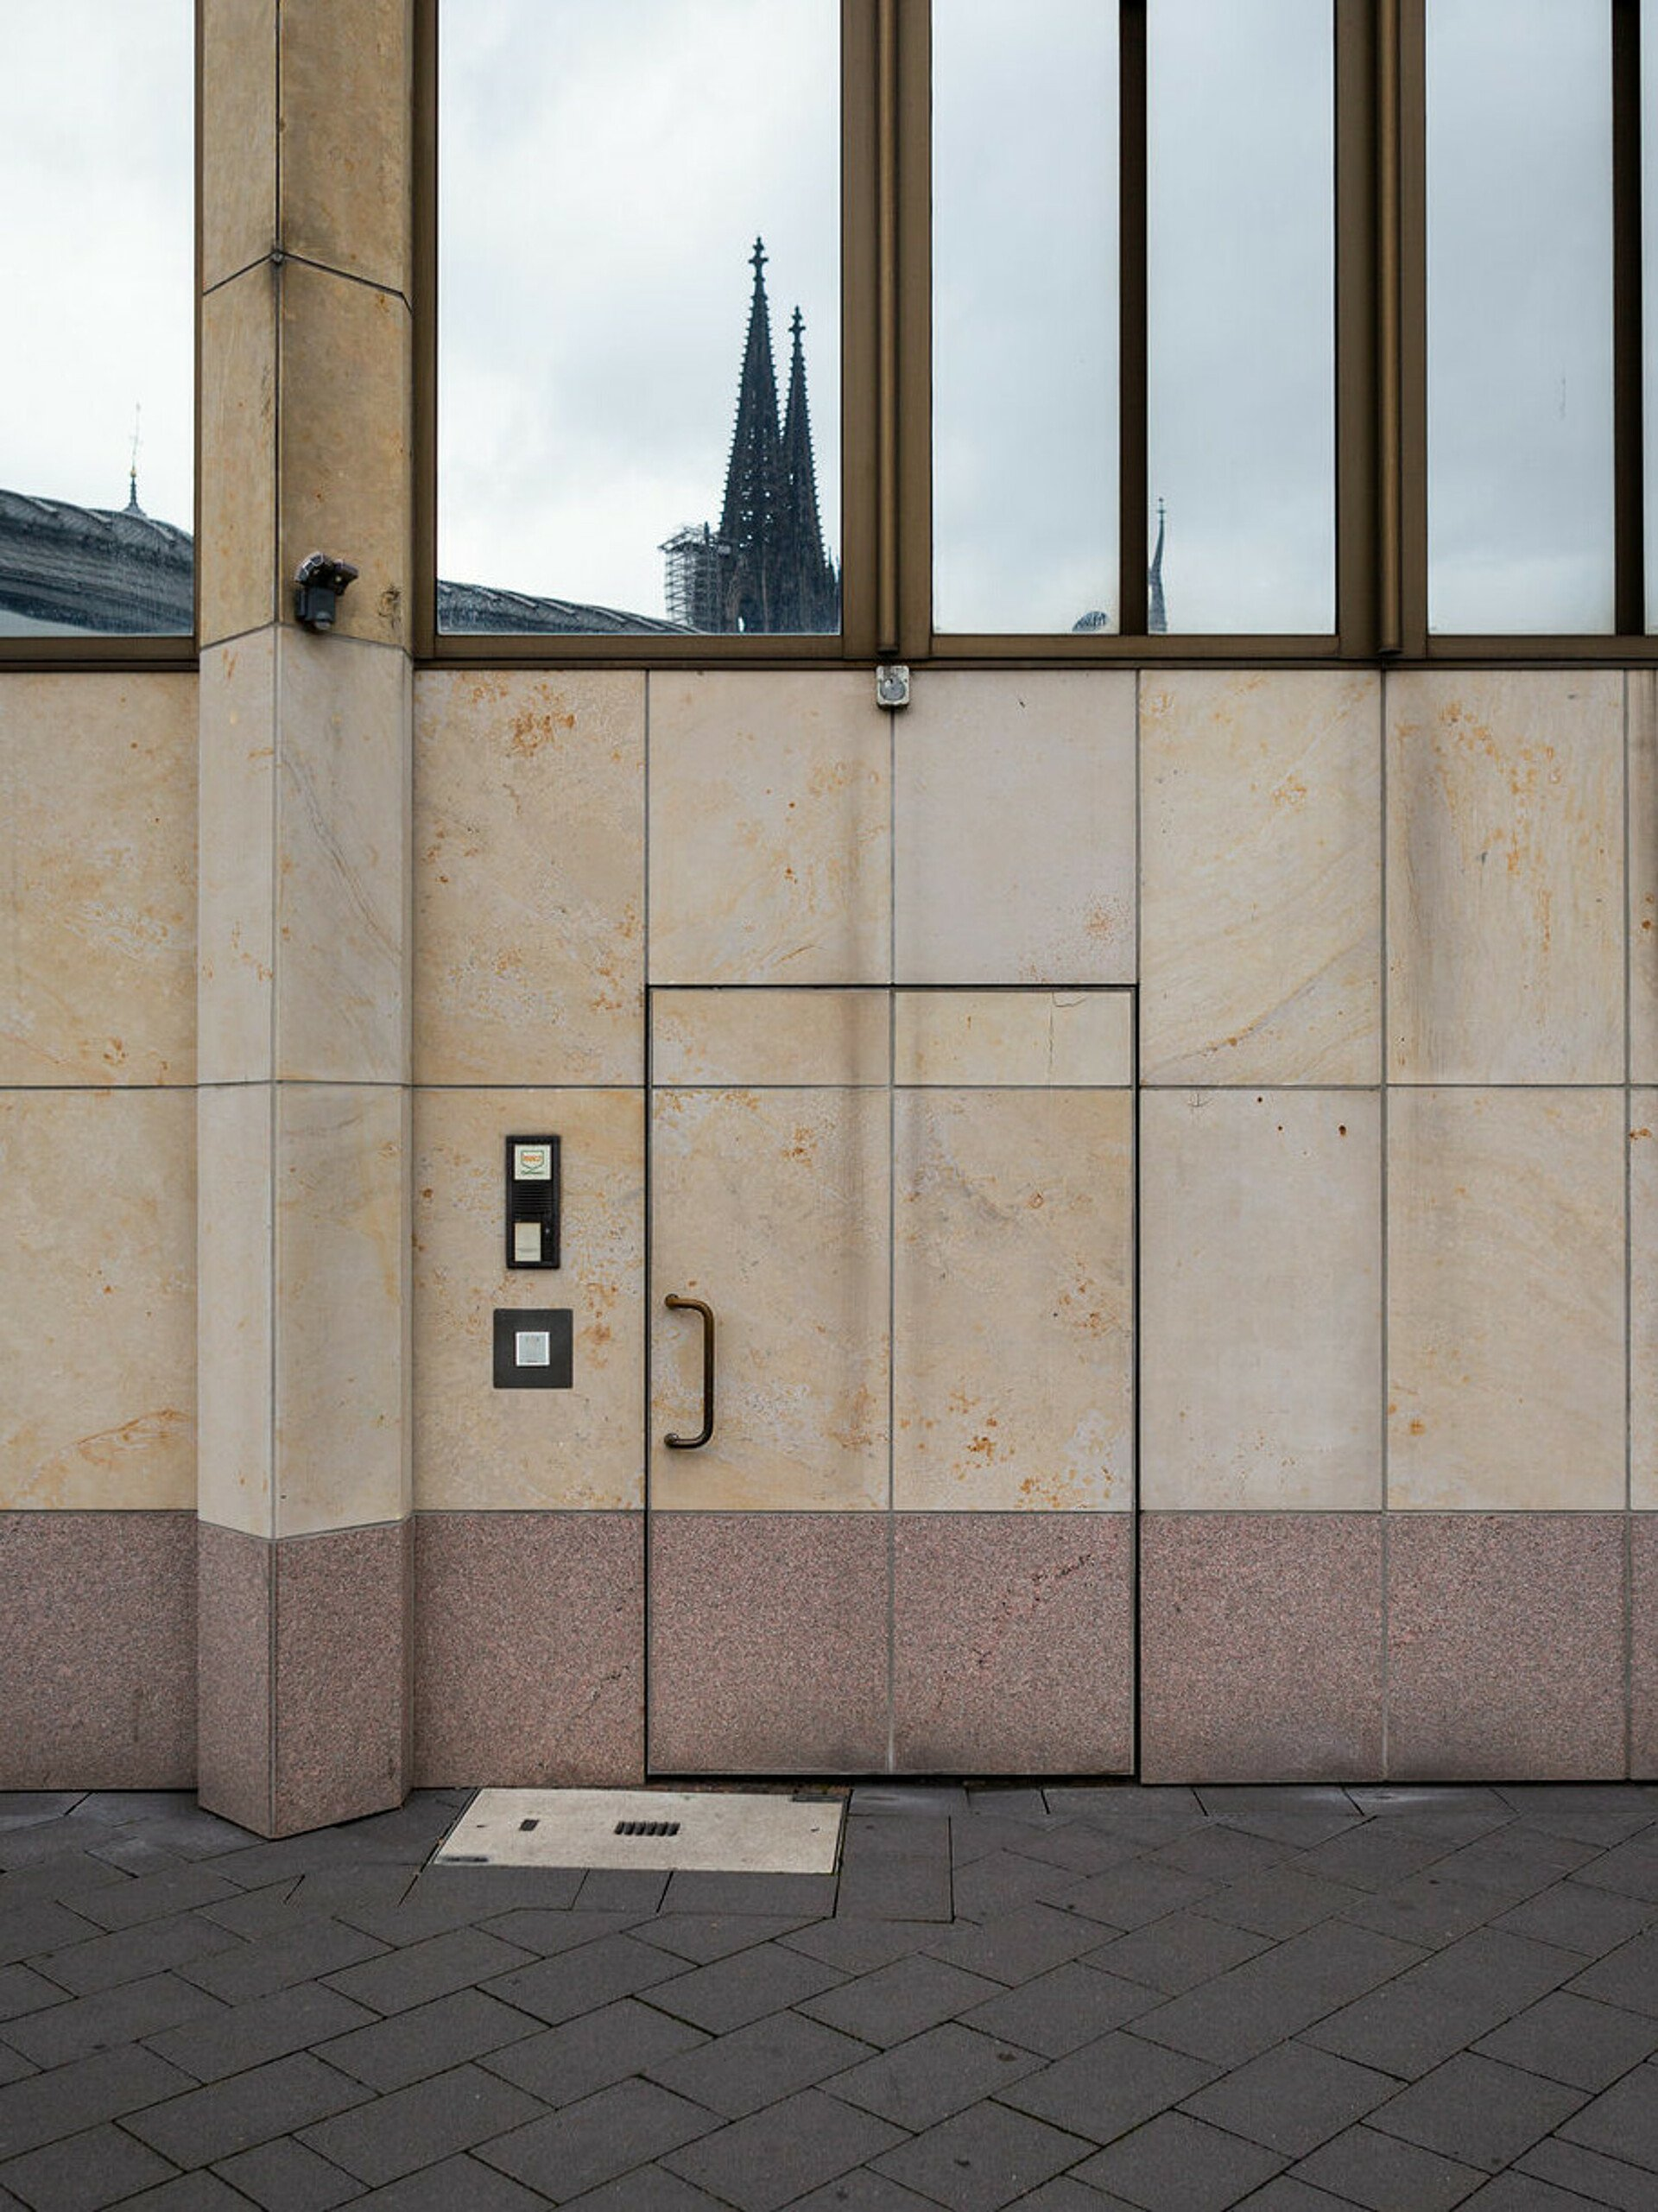 Eingang zum Riphahn-Bunker in Köln